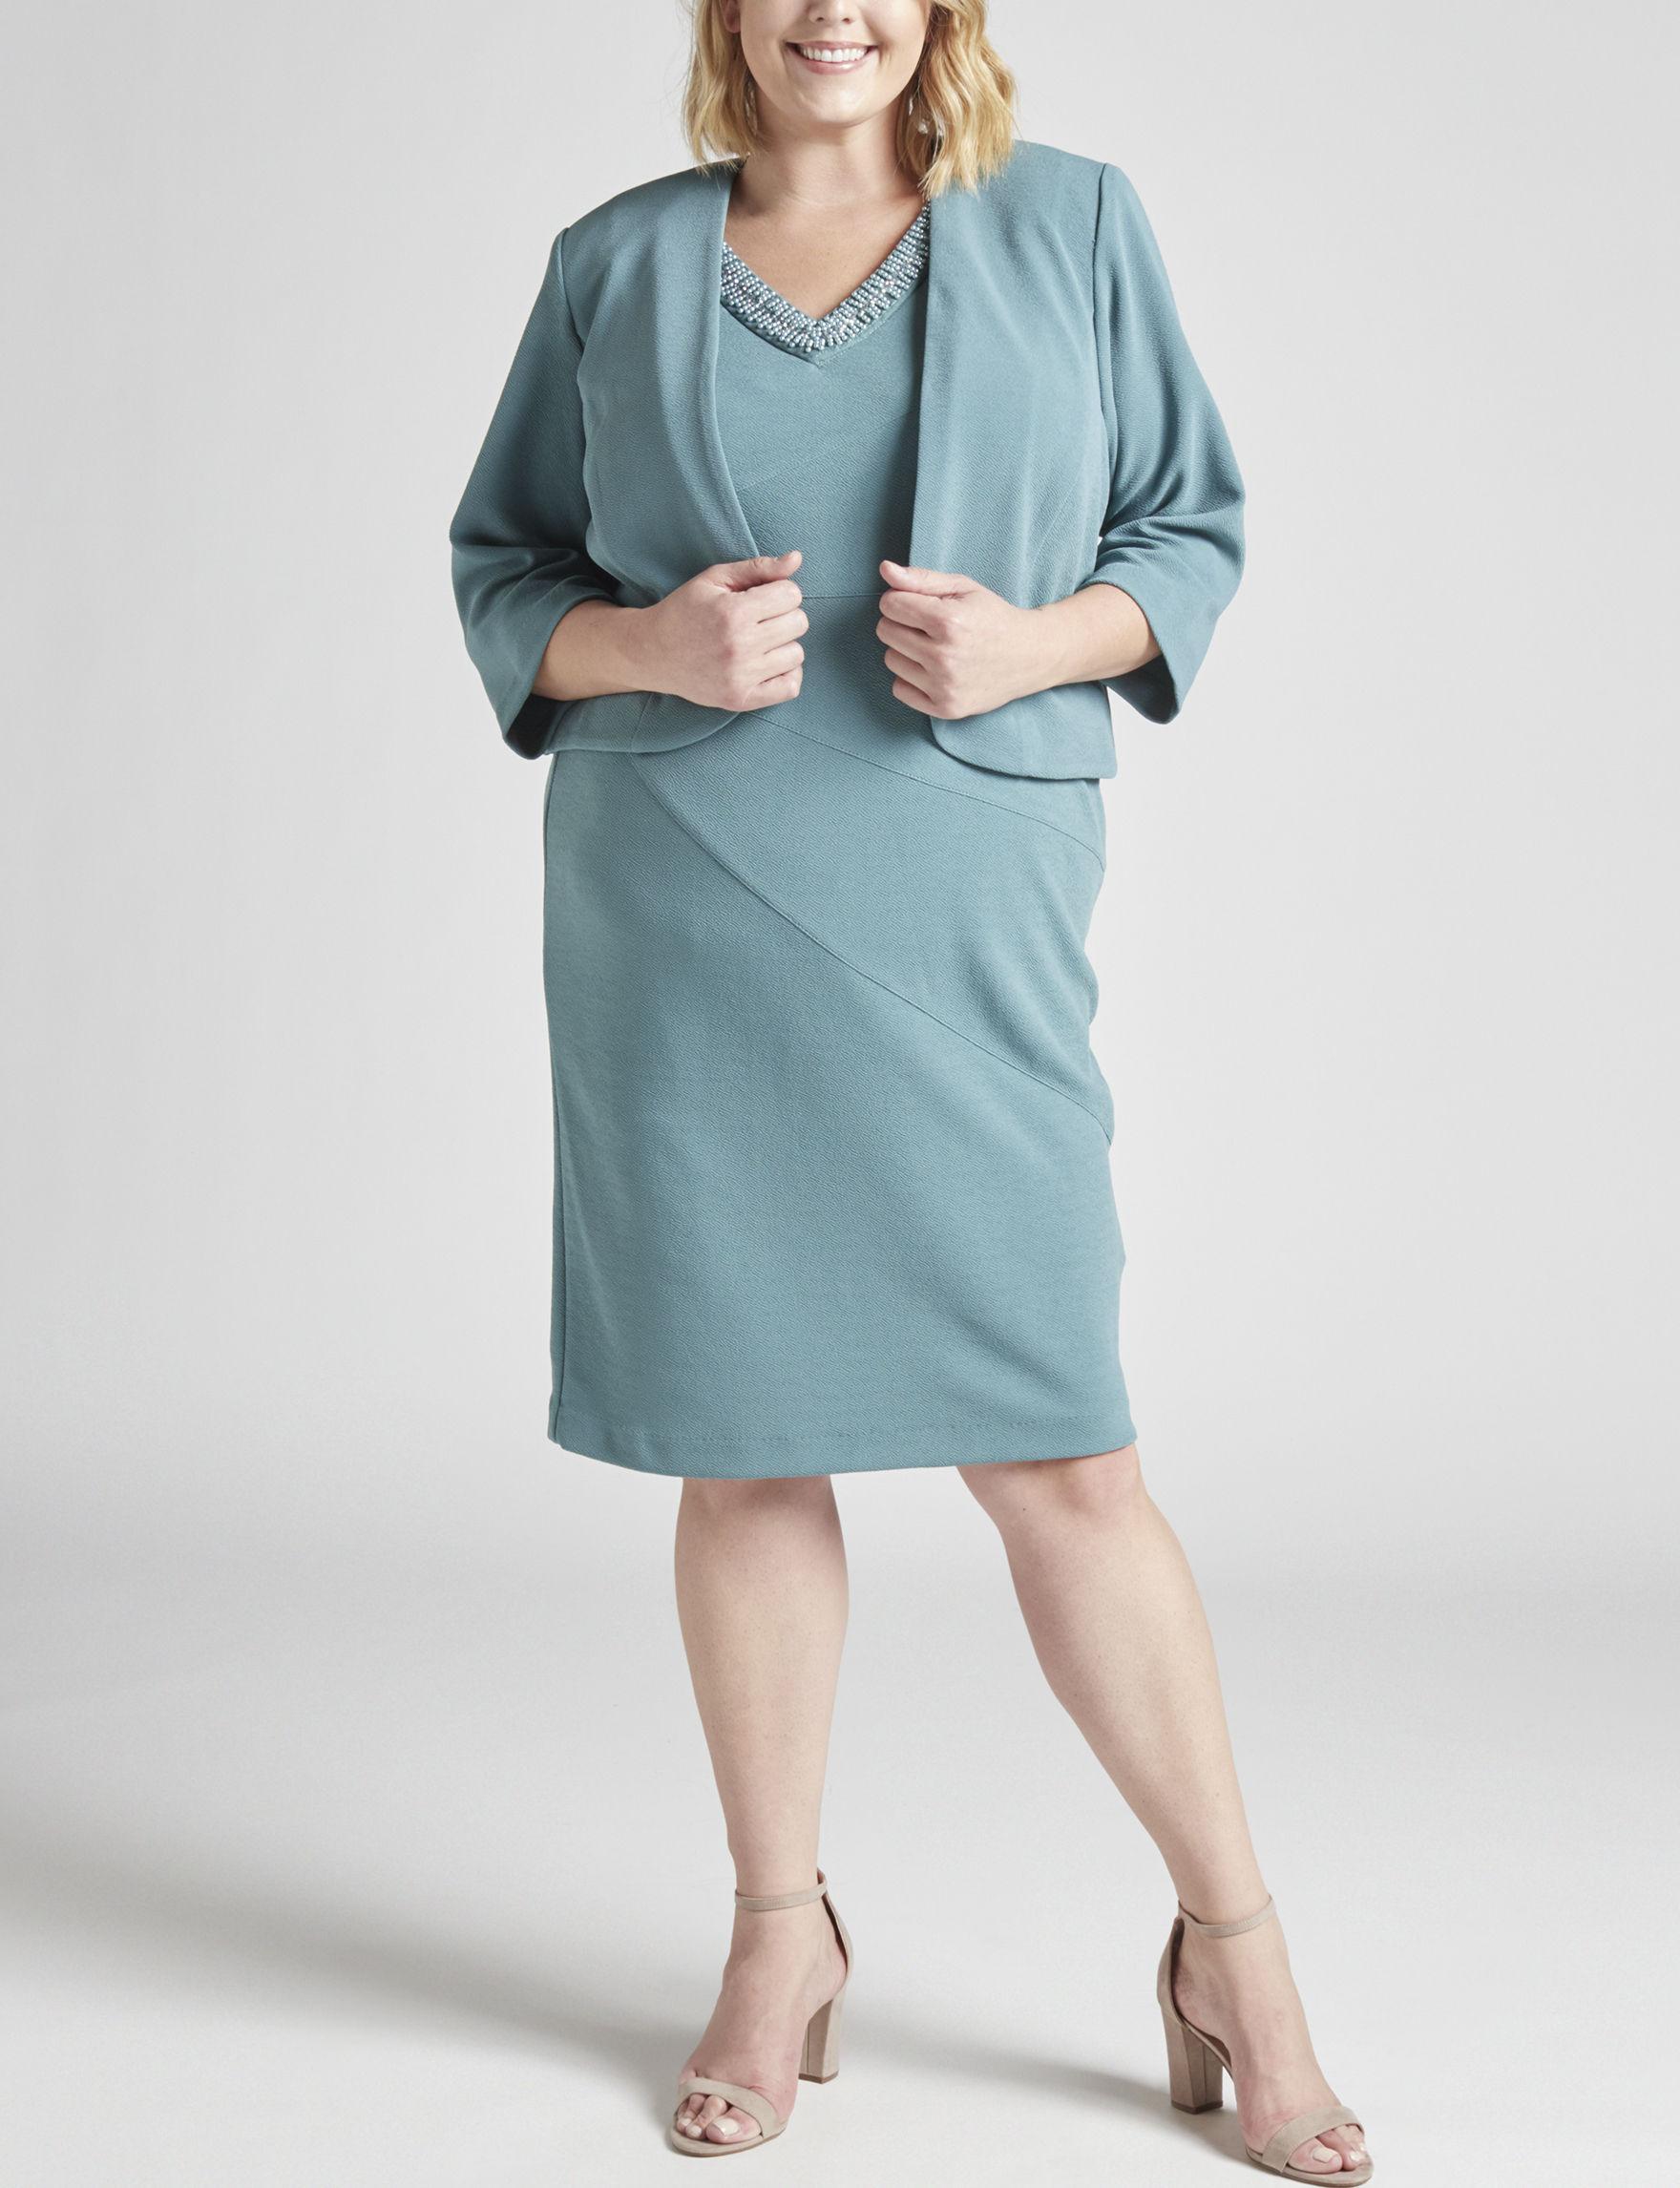 Dana Kay Green Evening & Formal Jacket Dresses